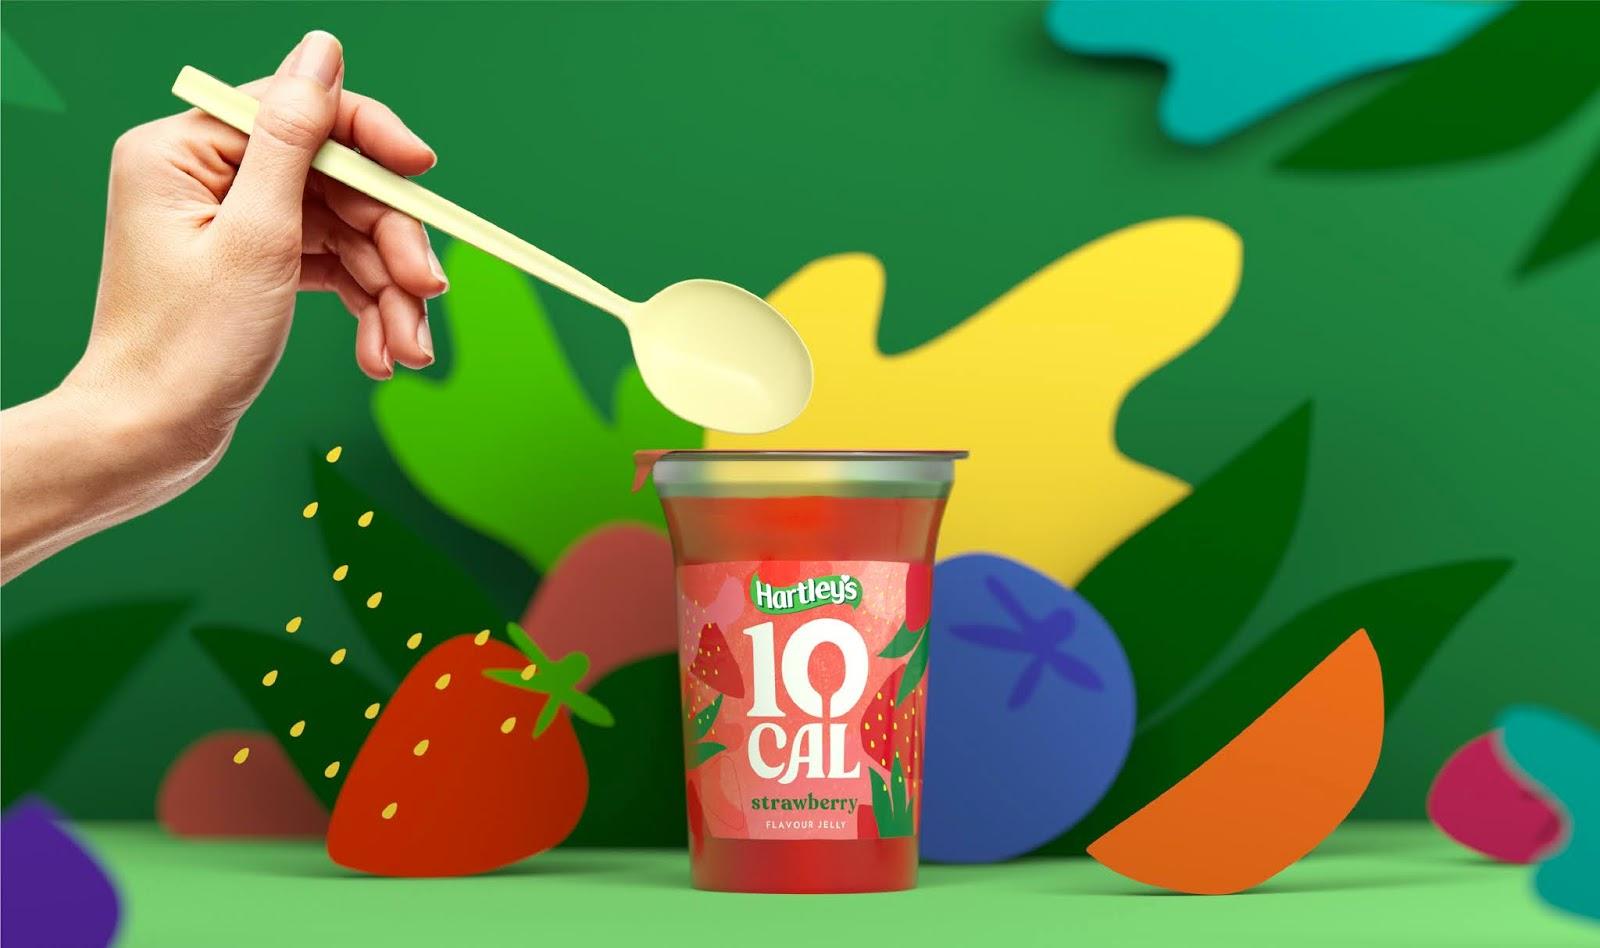 Hartley's 10 Cal Jelly